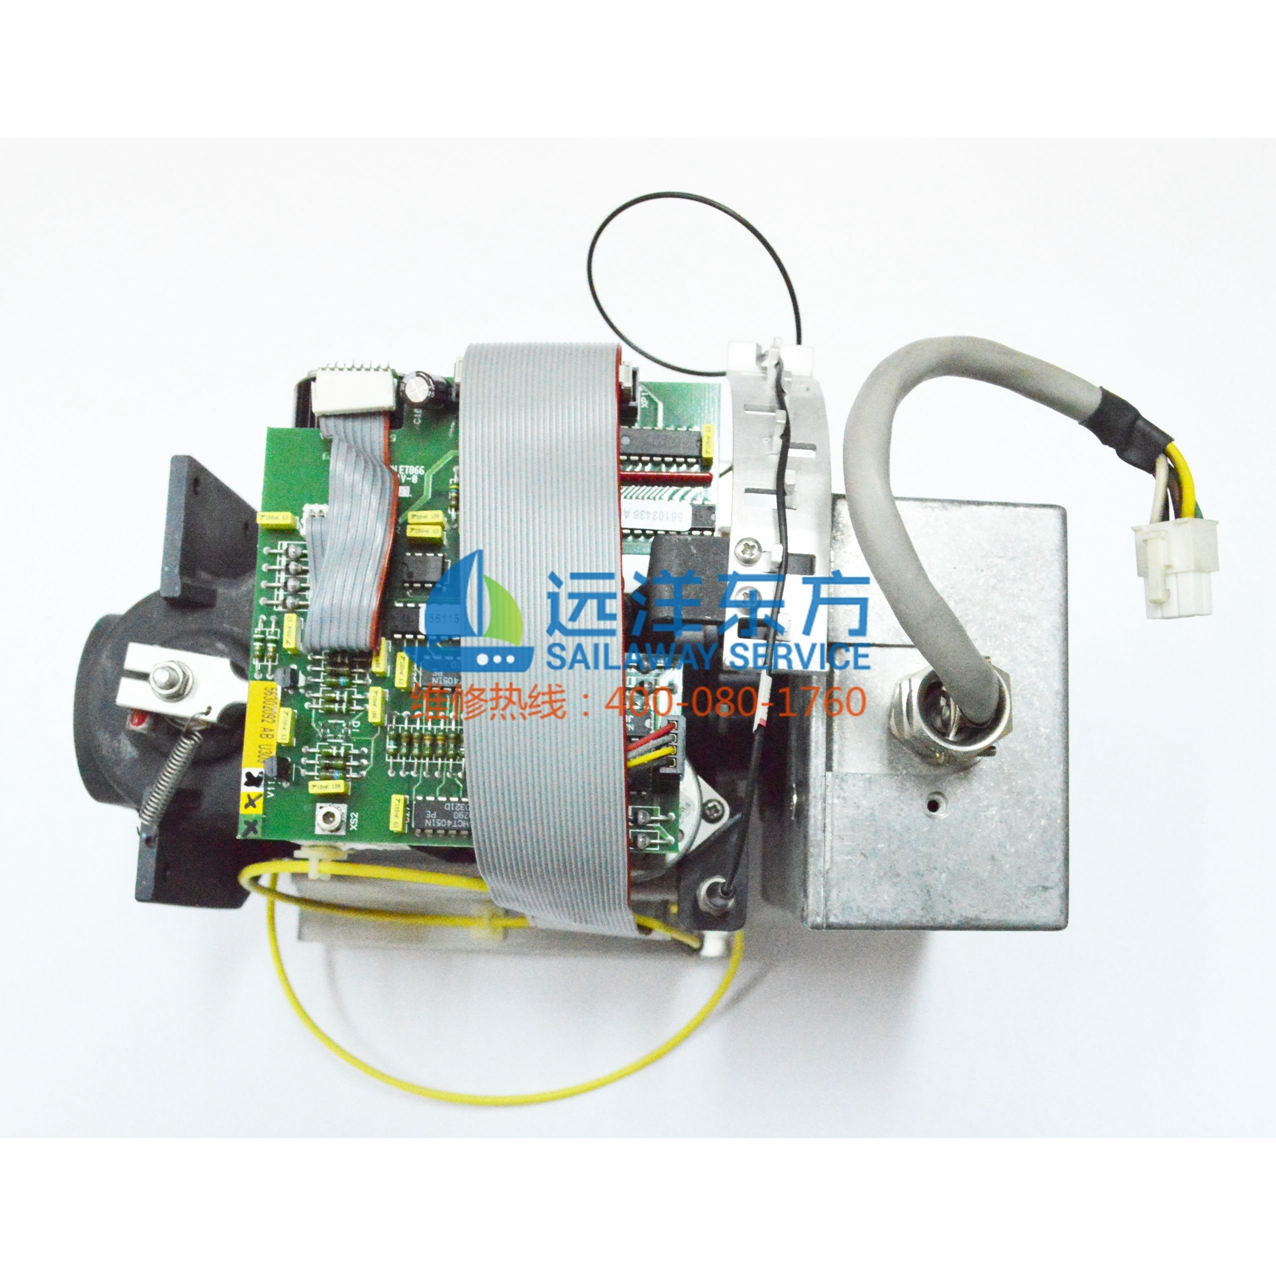 GE AKTA  purifier蛋白纯化仪单测器 货号1405